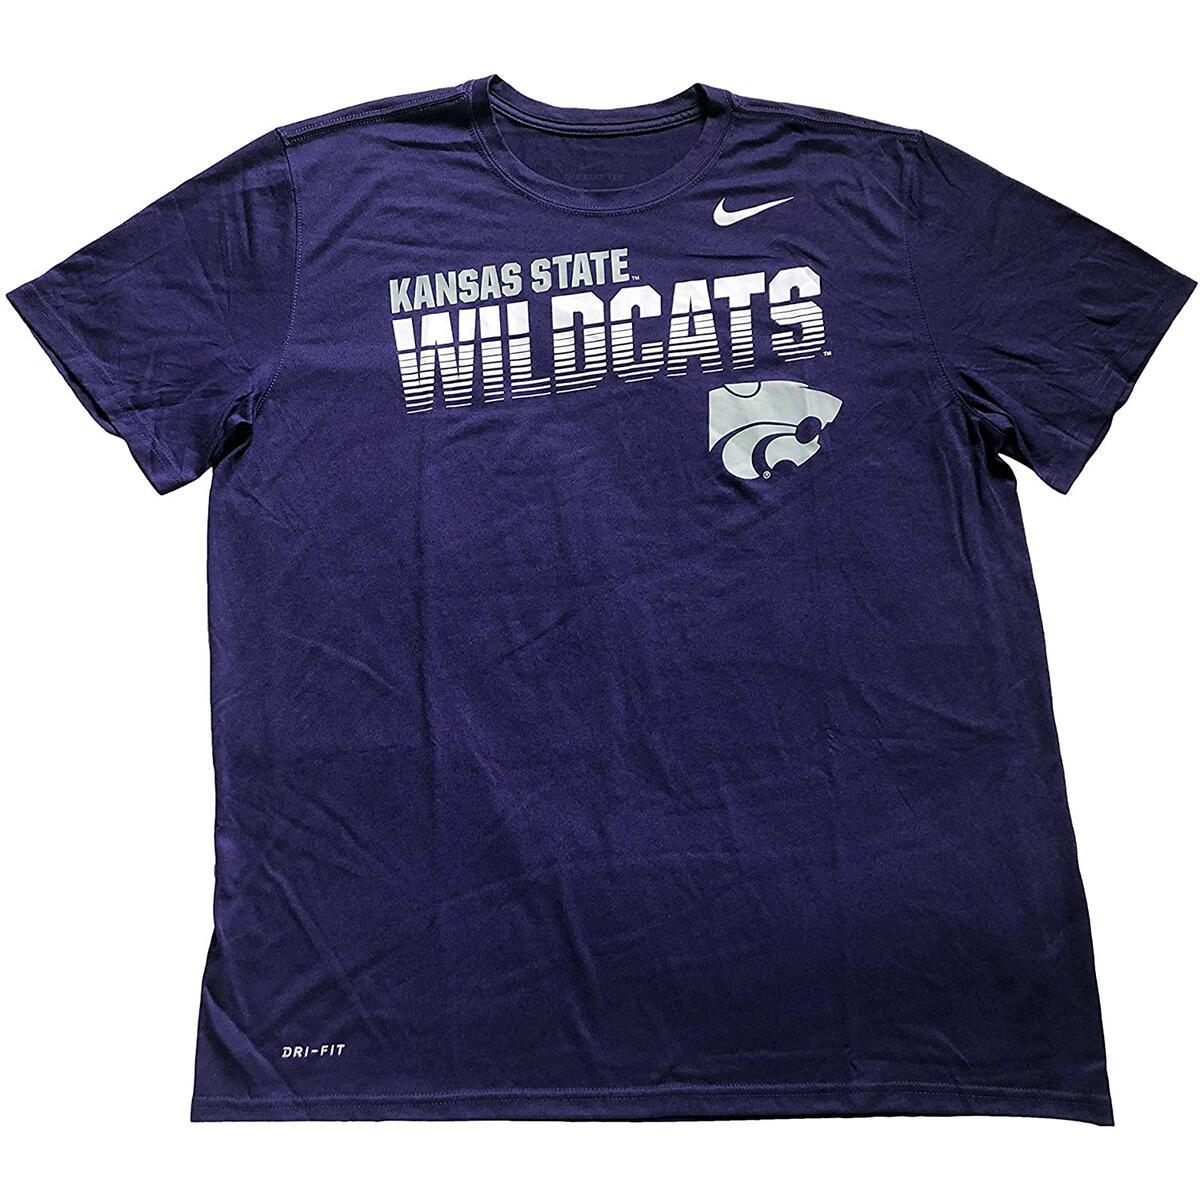 Nike Men's Kansas State University NCAA Dri-Fit Short Sleeve 100% Polyester T-Shirt (X-Large, Purple AO6775)